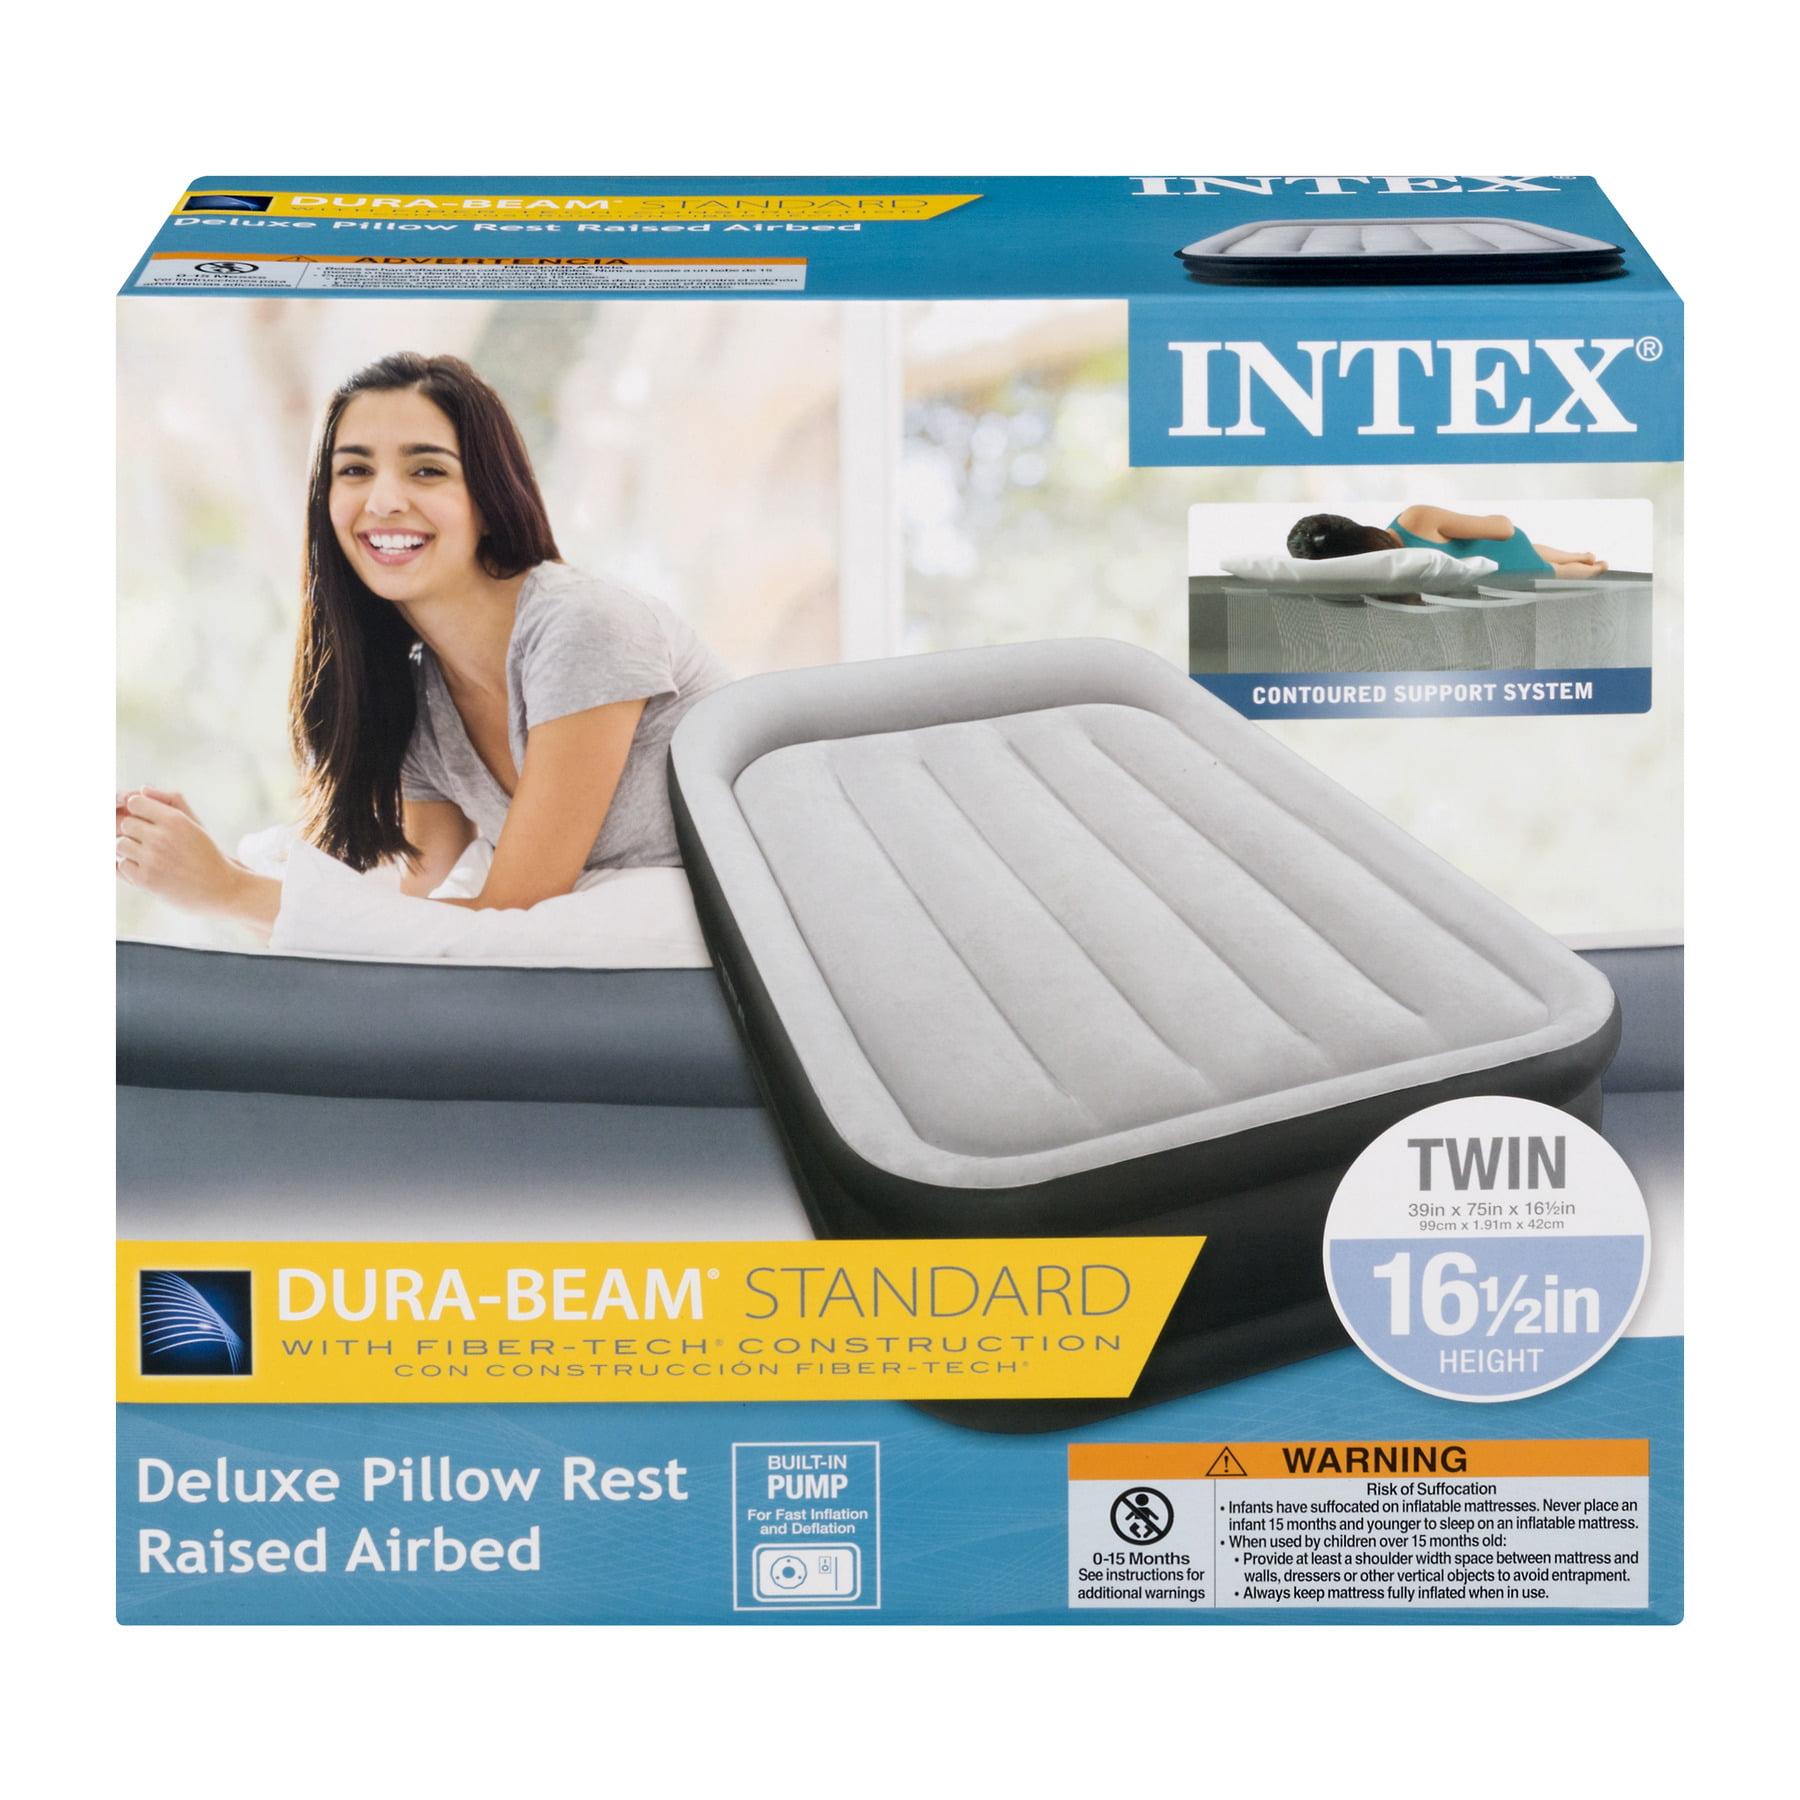 Intex mattress instructions